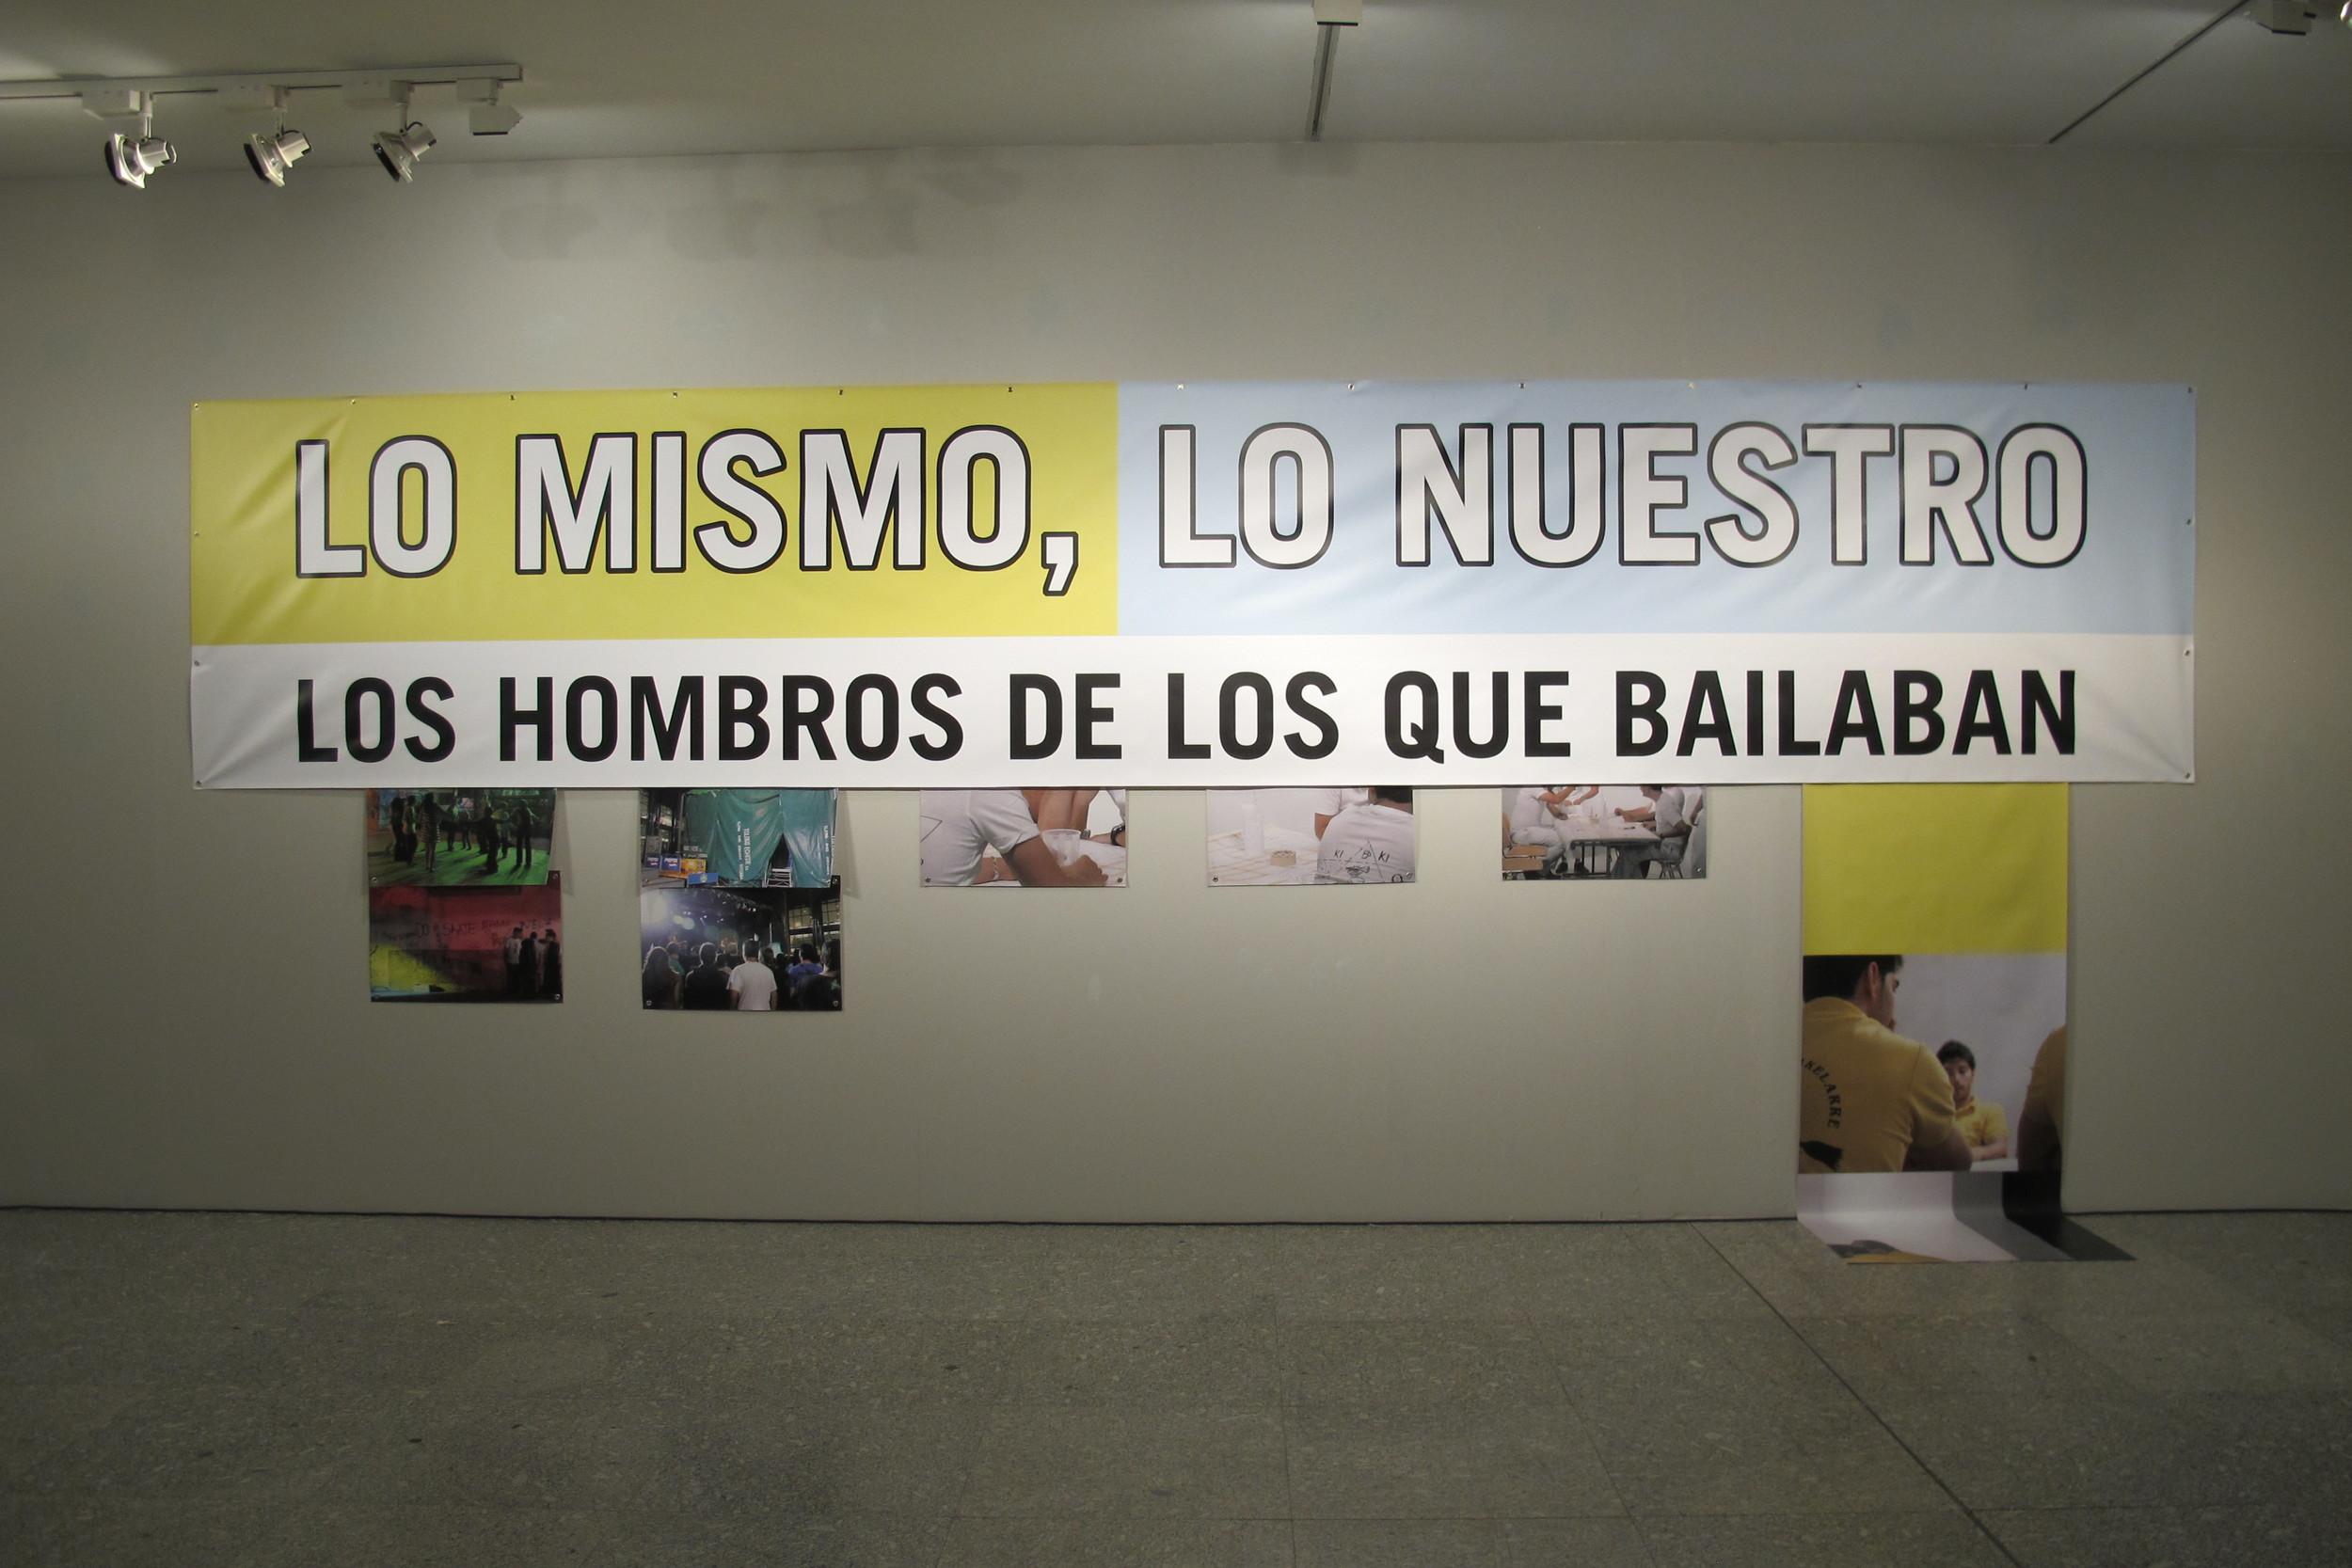 LO MISMO, LO OTRO Banners 196 x 160 x 118 2011